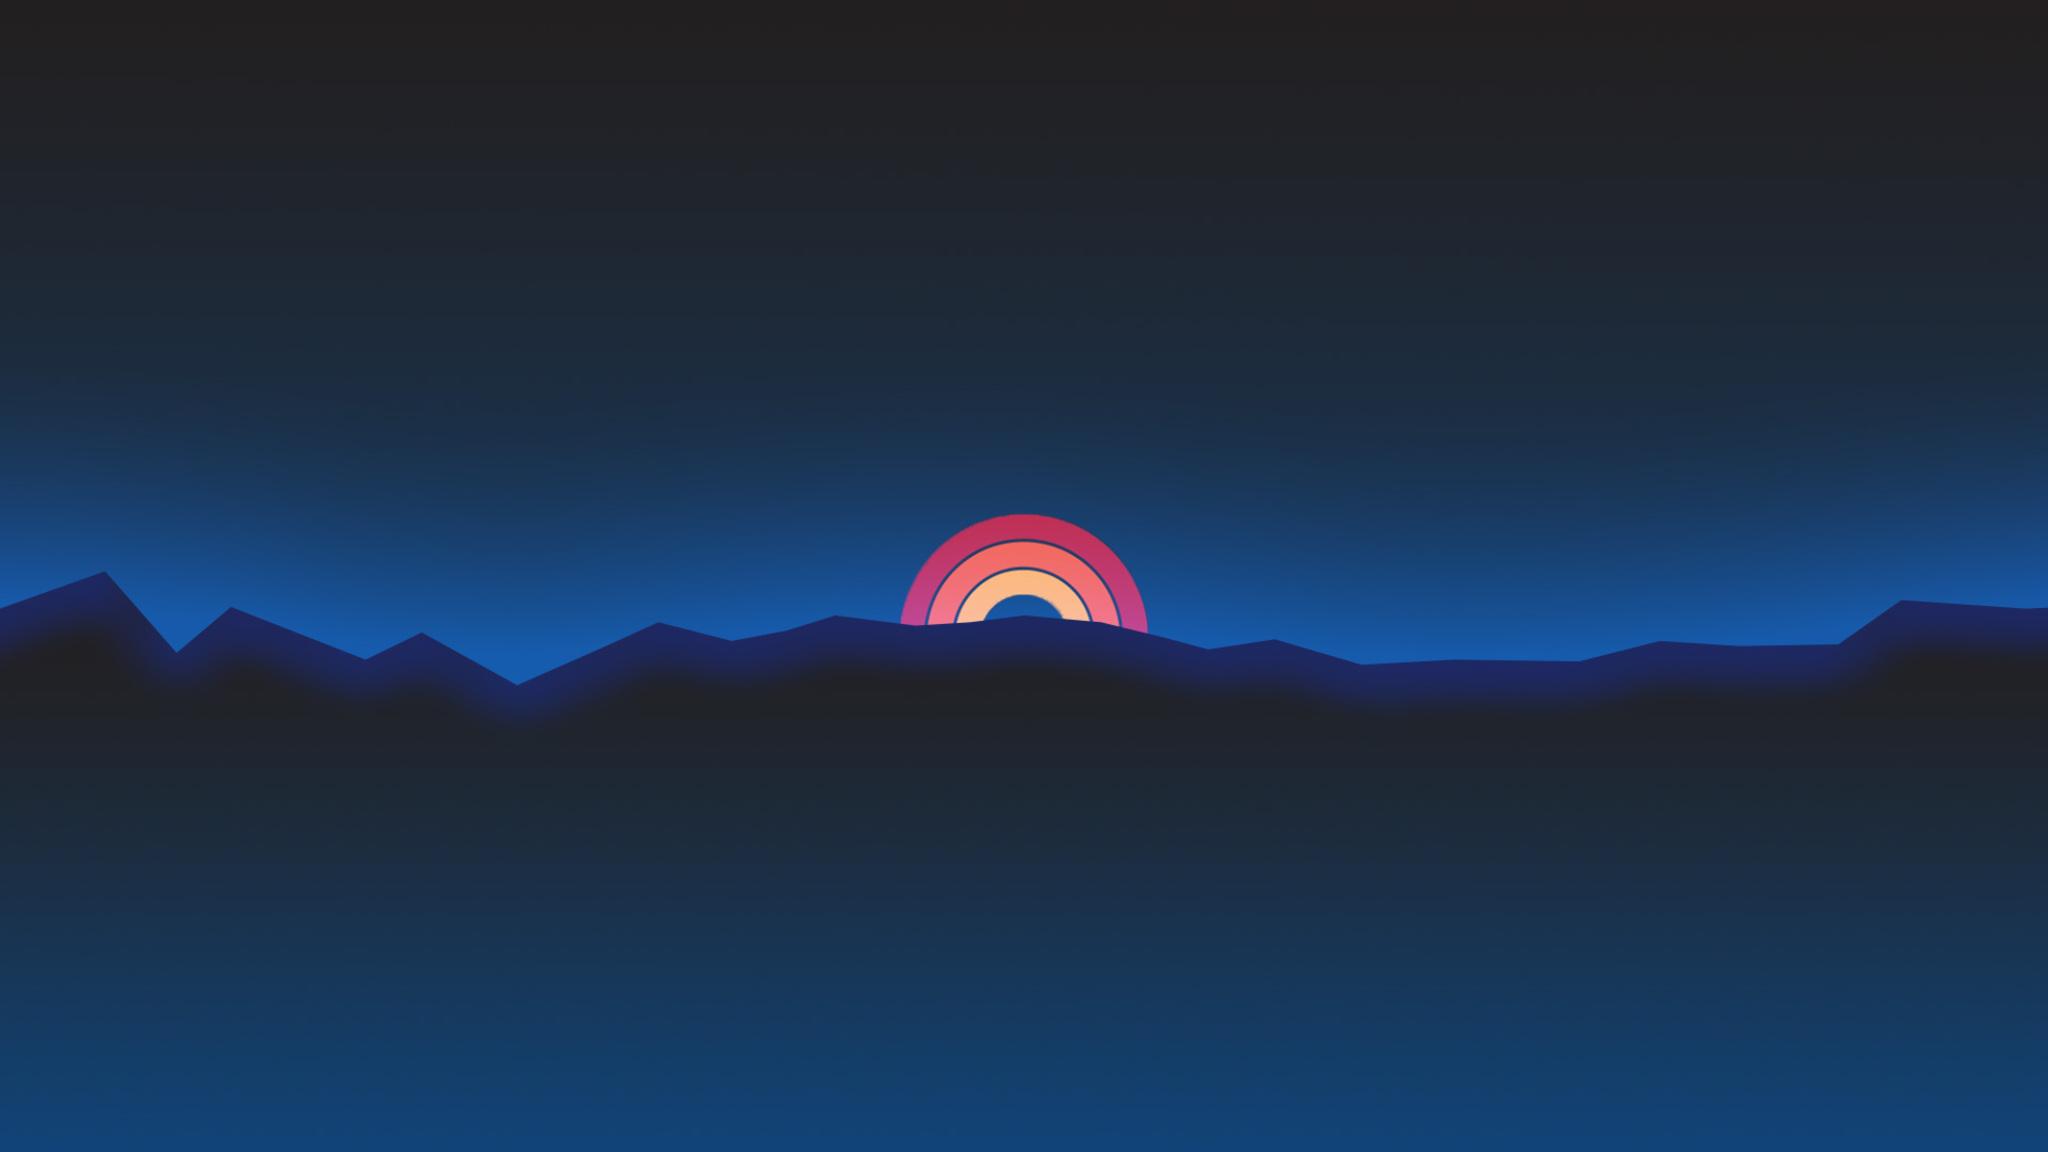 2048x1152 Minimalism Neon Rainbow Sunset Retro Style